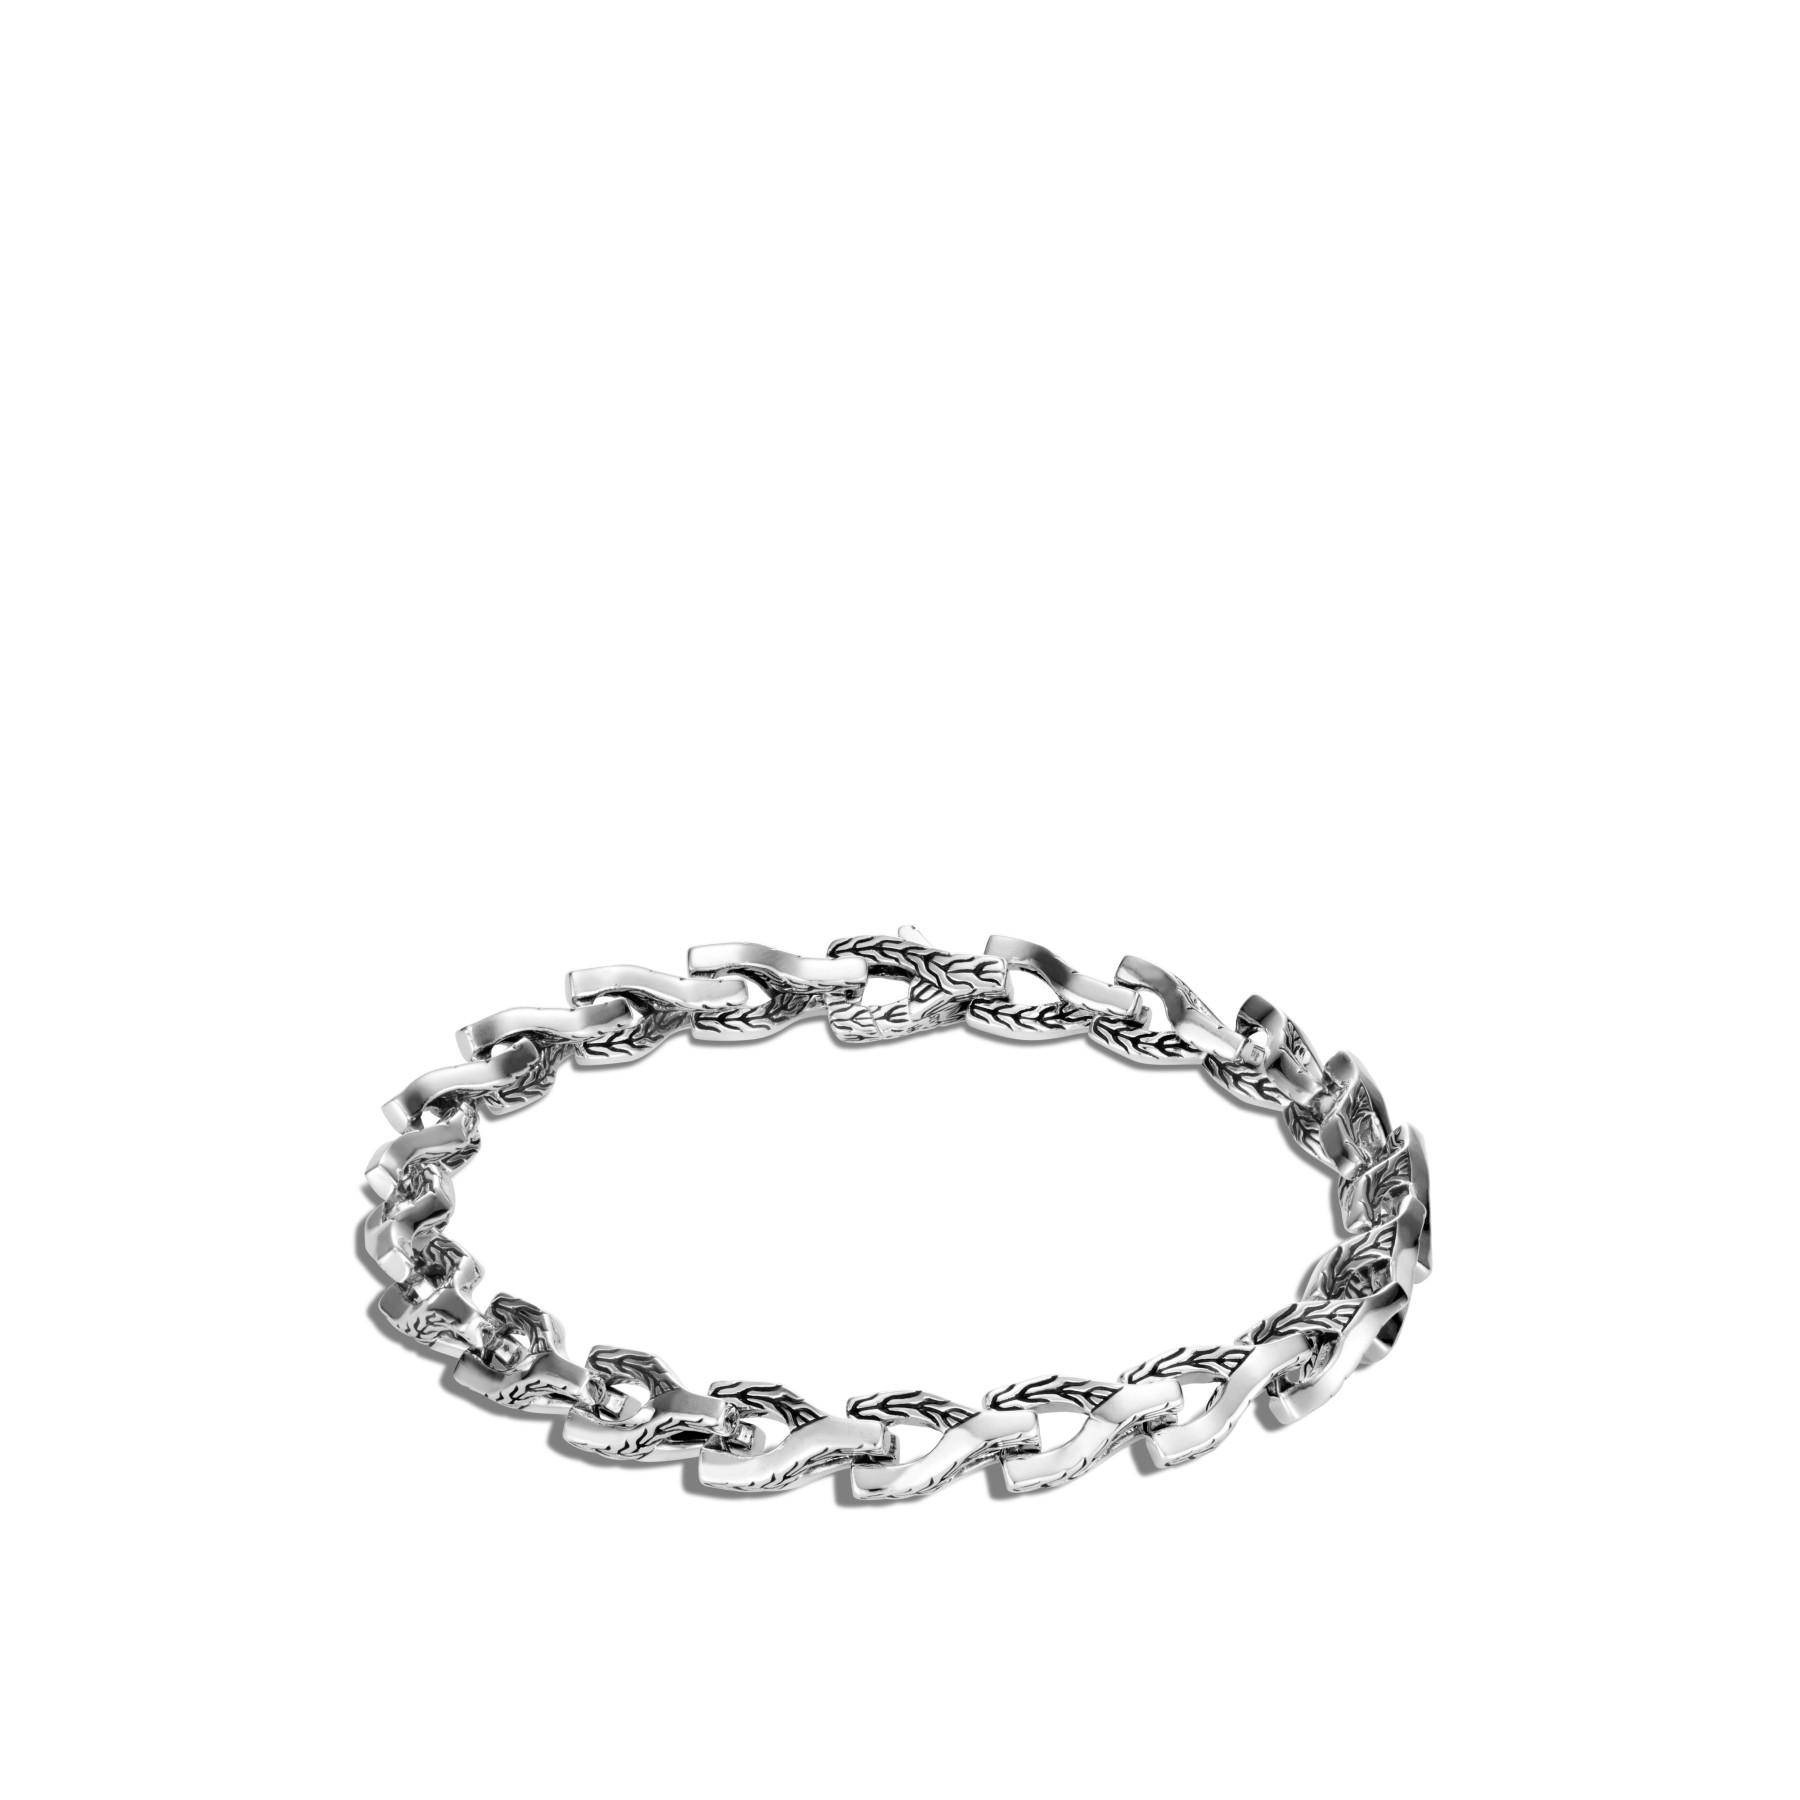 John Hardy Asli Classic Chain Silver Link Bracelet - 7mm front view